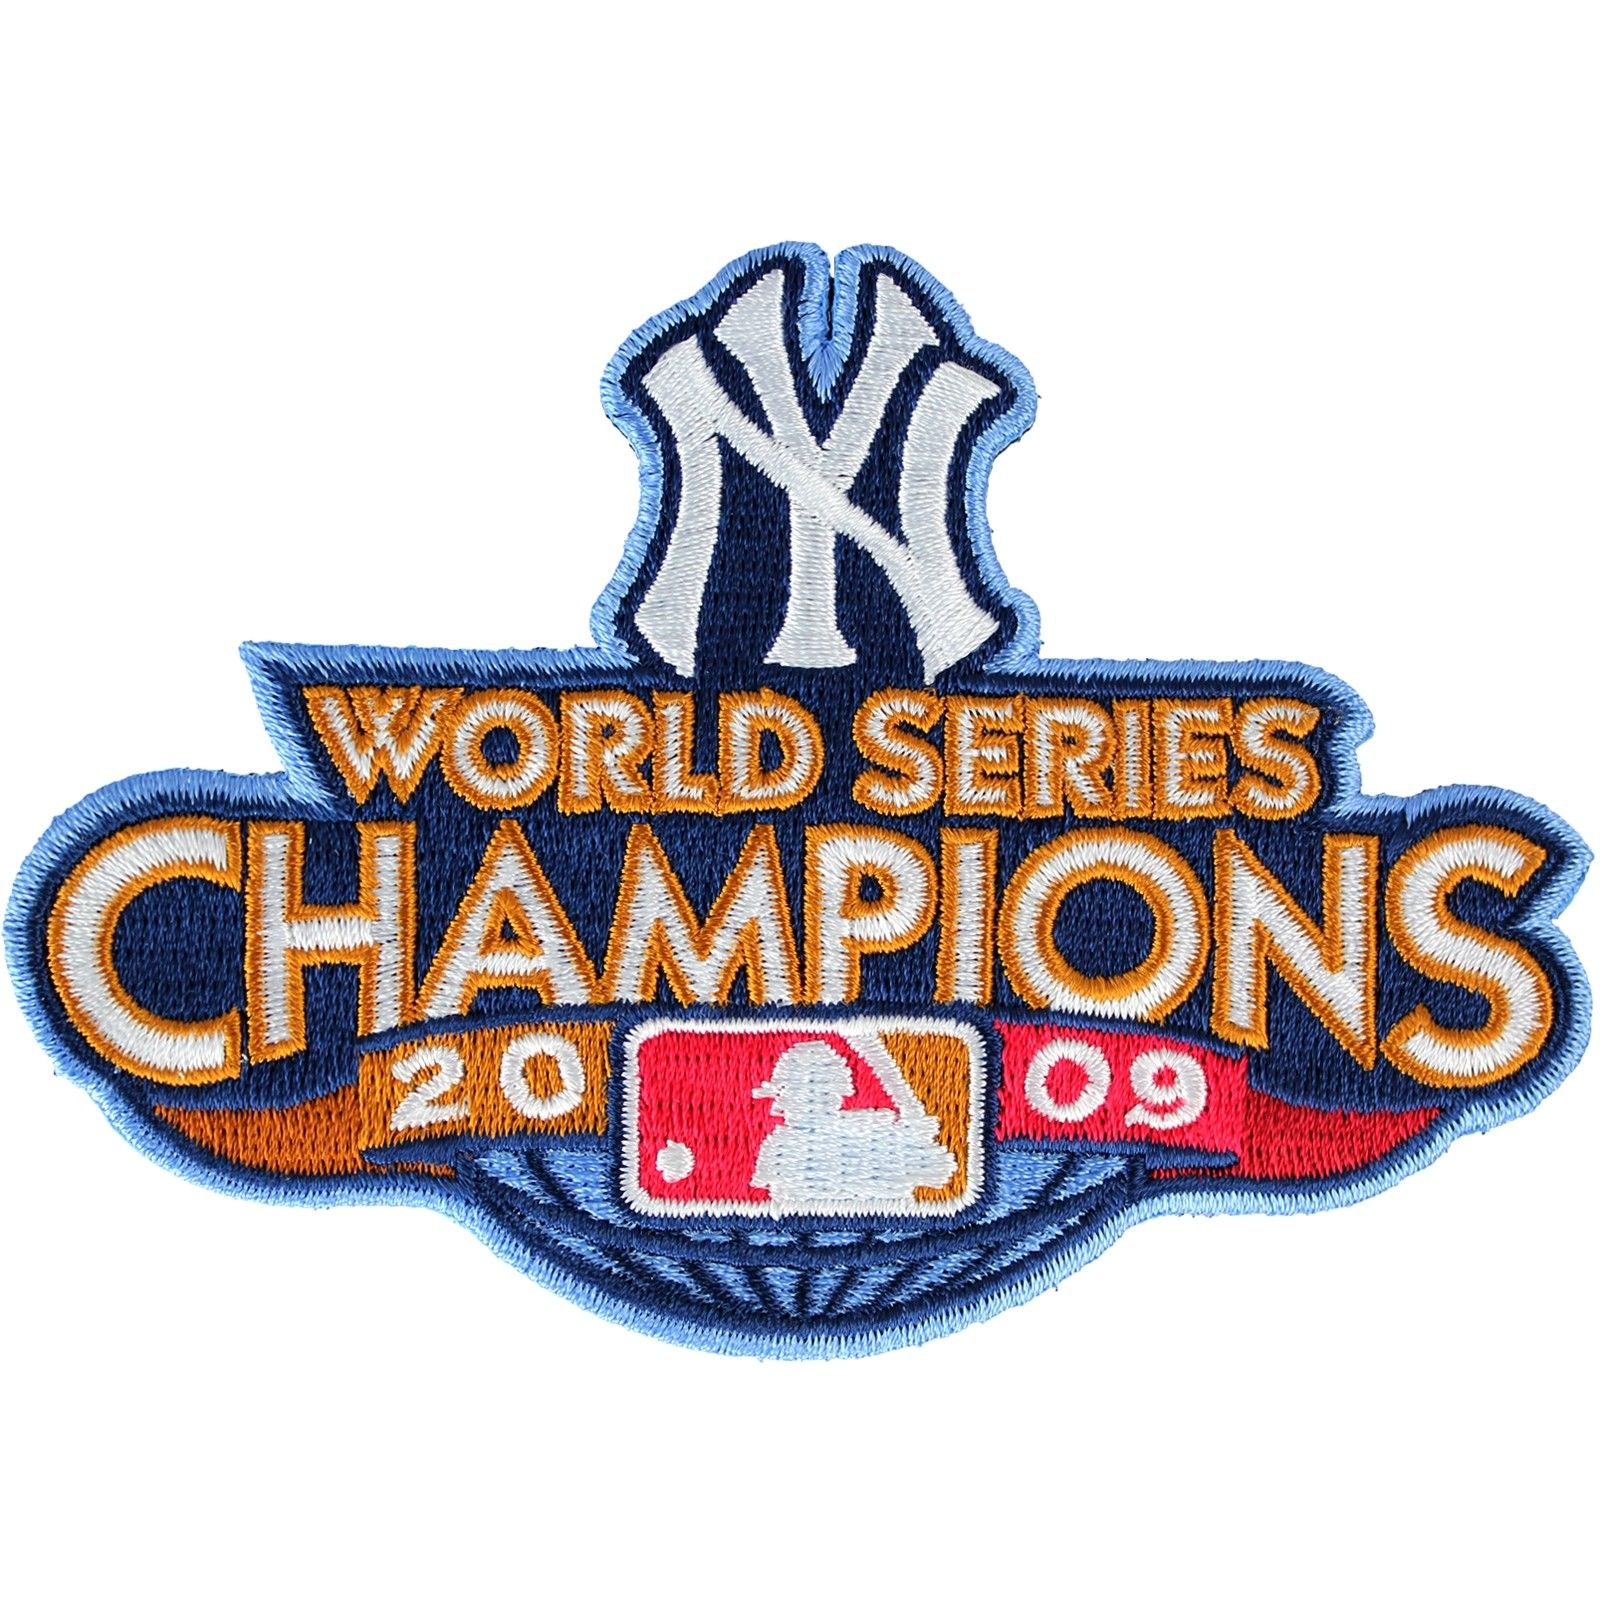 1495 2009 world series champions york yankees jersey